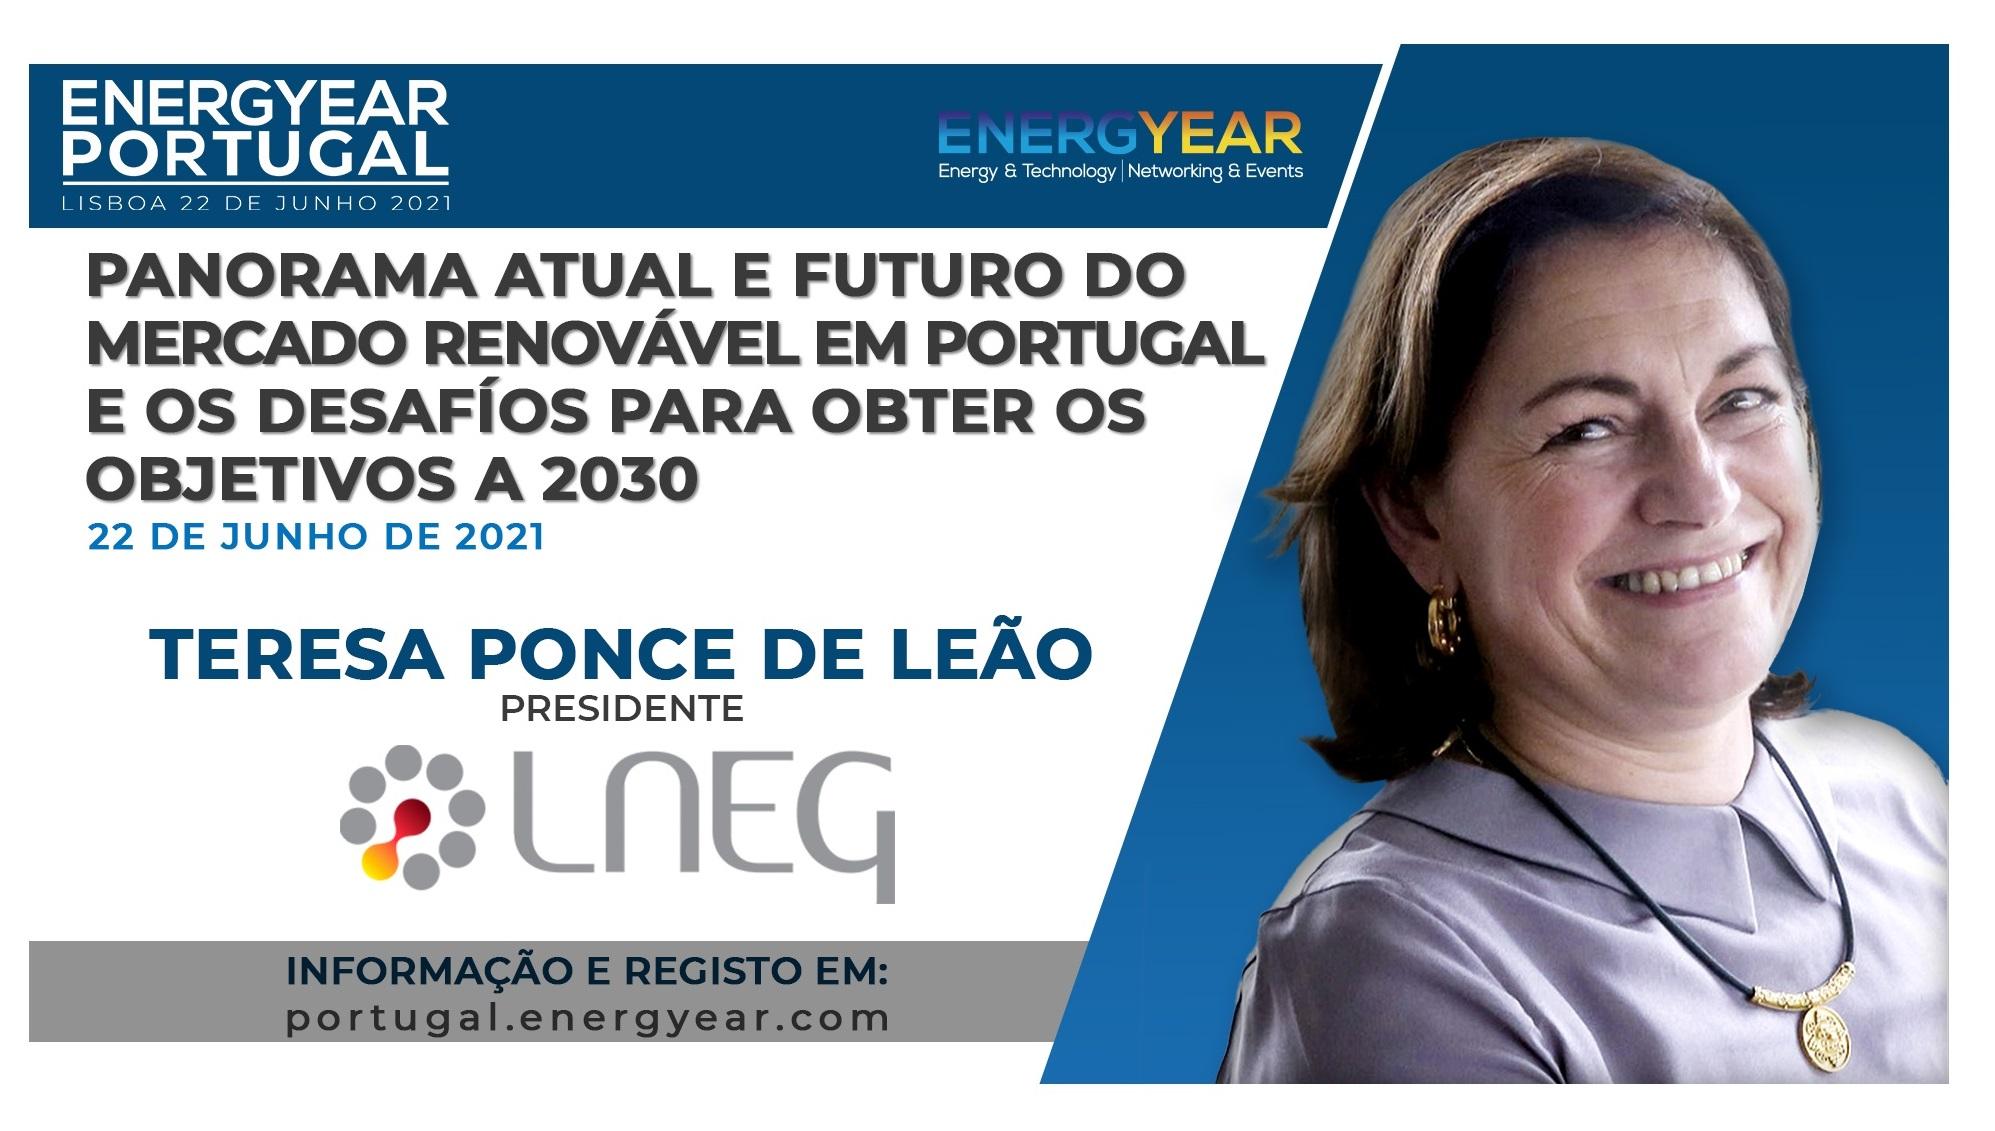 lneg-participa-no-energyear-portugal-2021